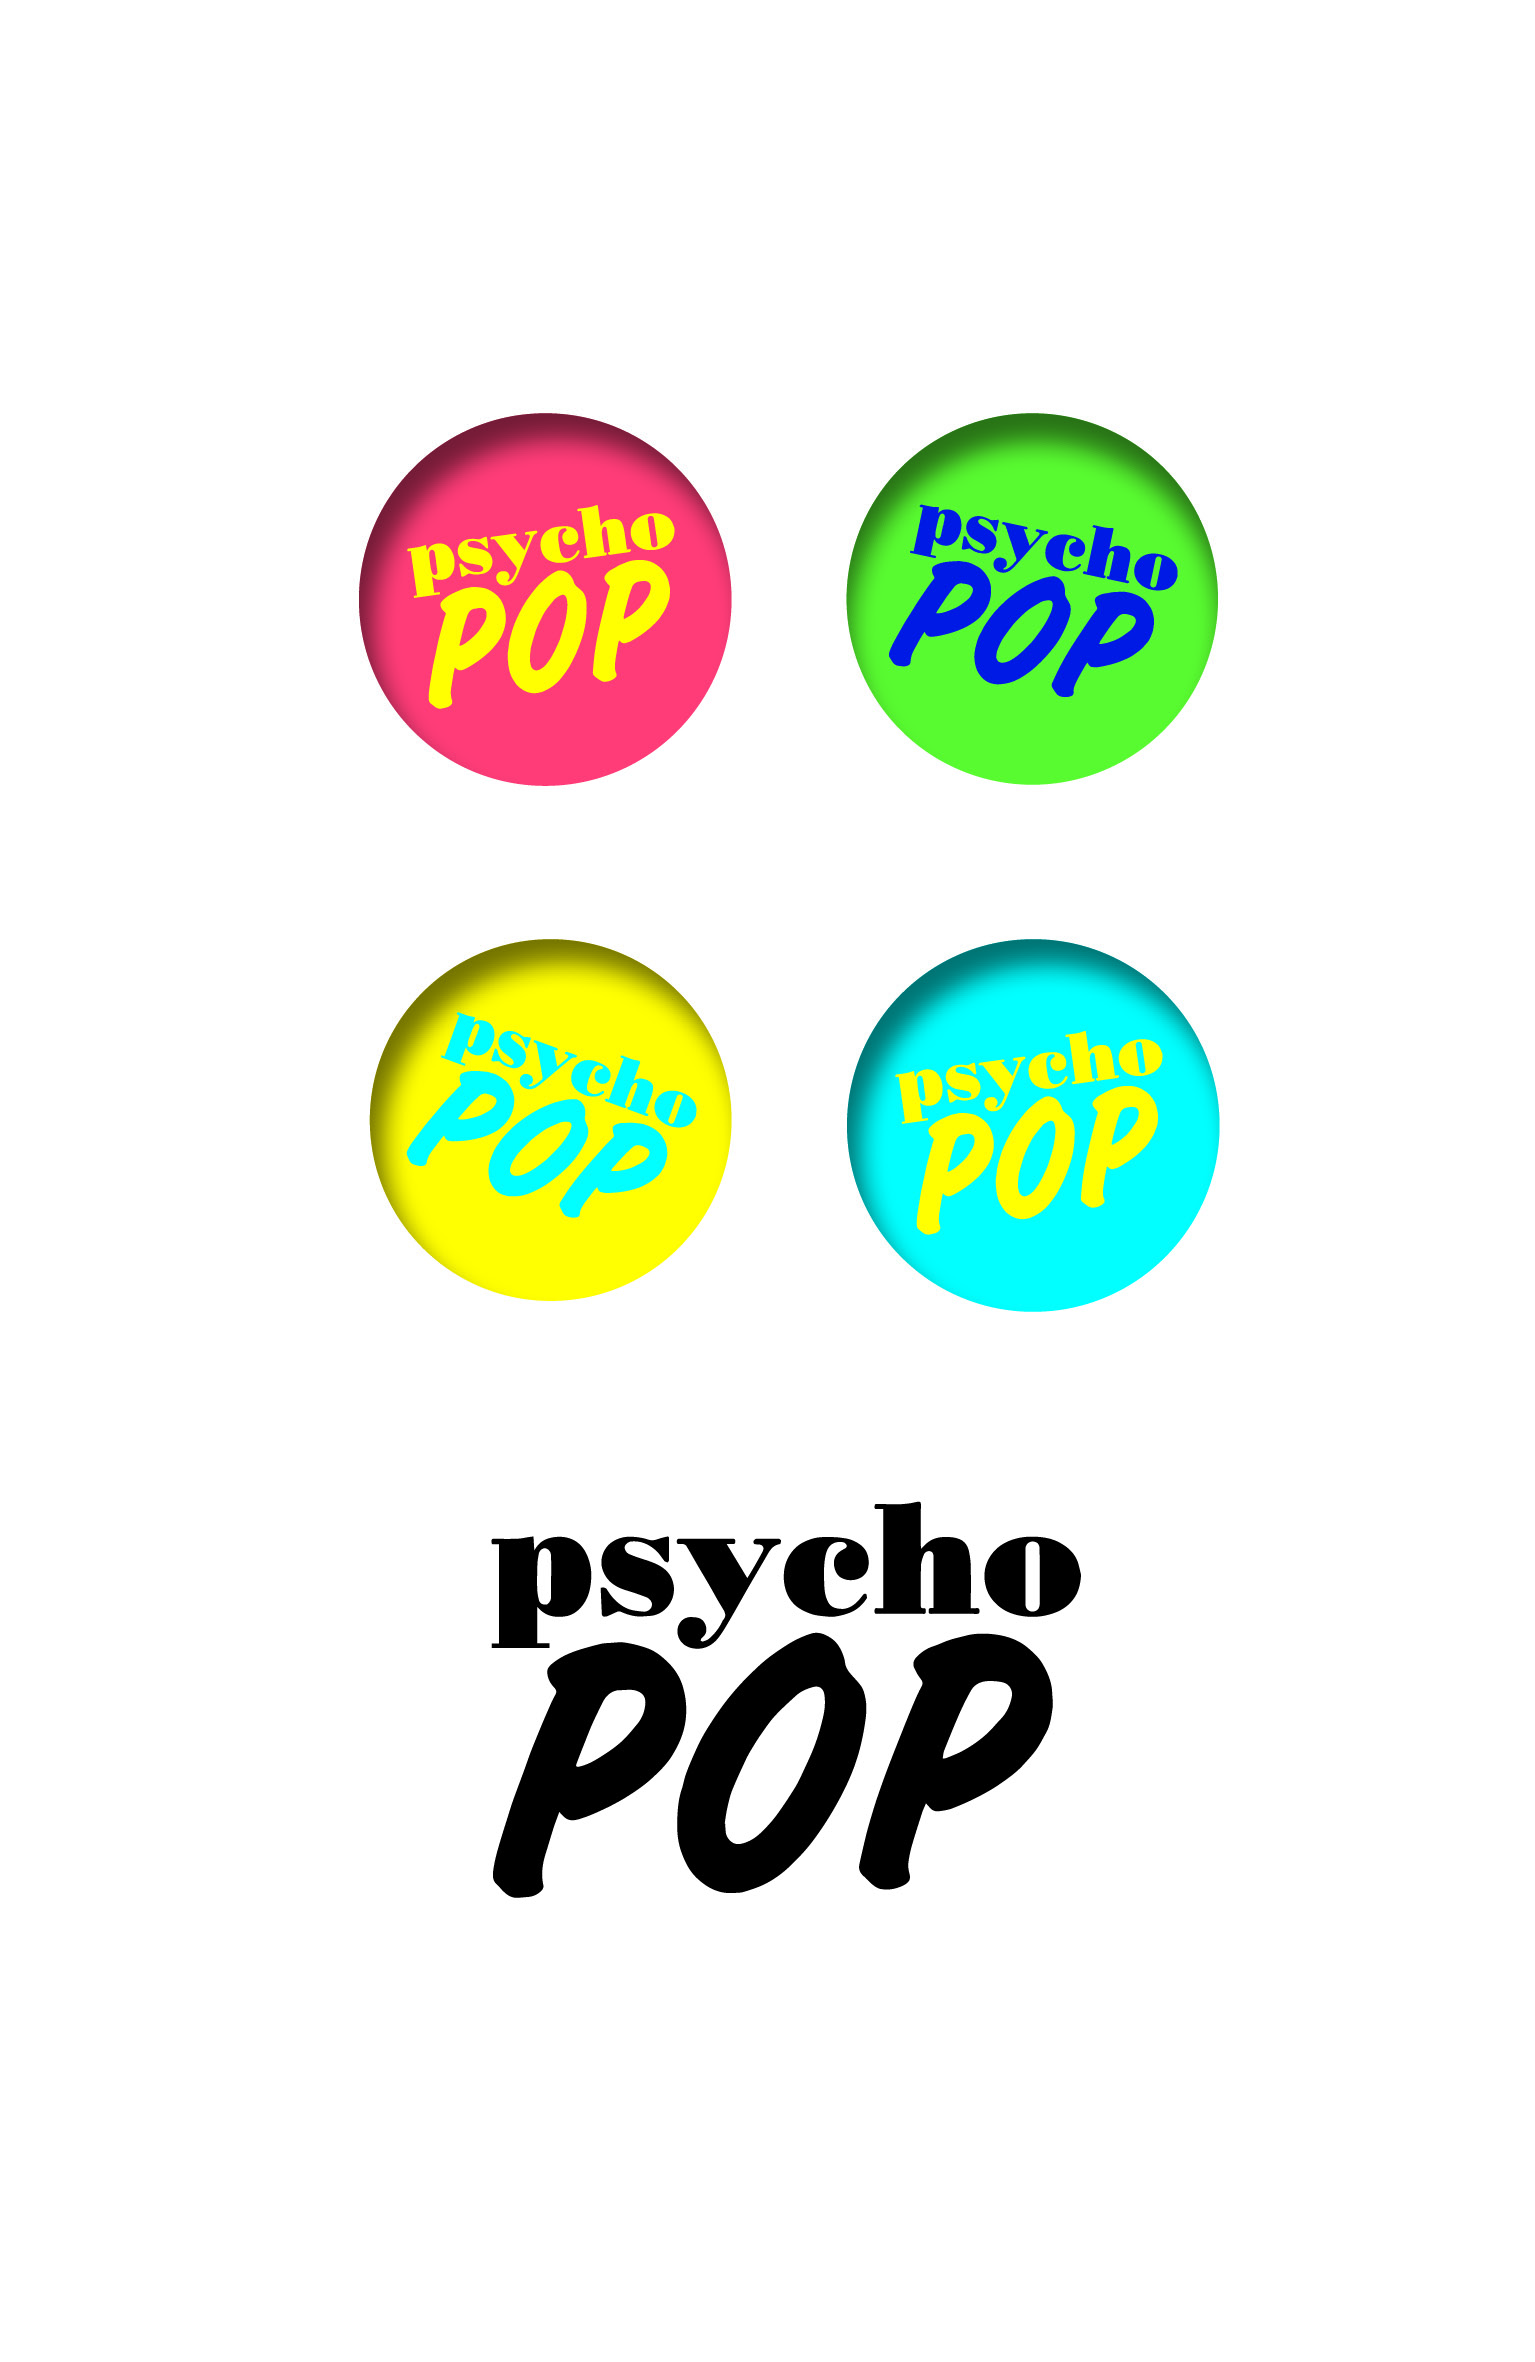 Psycho pop